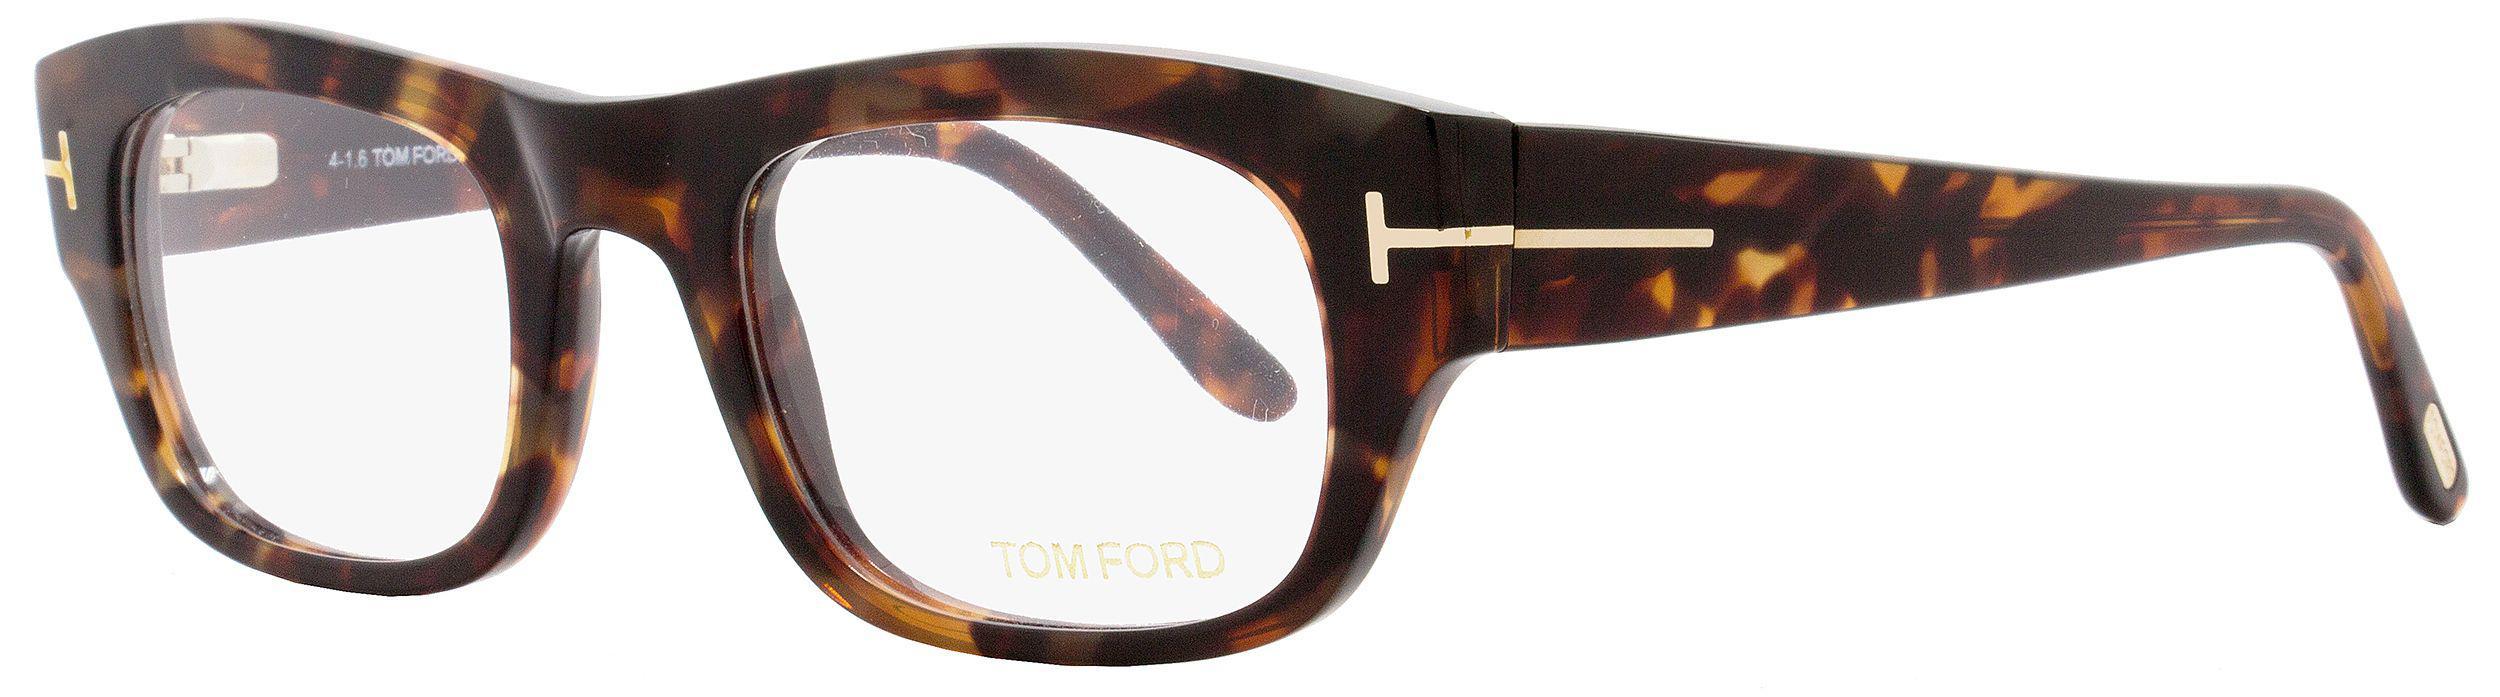 2bab88f3a89 Tom Ford - Multicolor Rectangular Eyeglasses Tf5415 054 Size  50mm Red  Havana gold Ft5415. View fullscreen